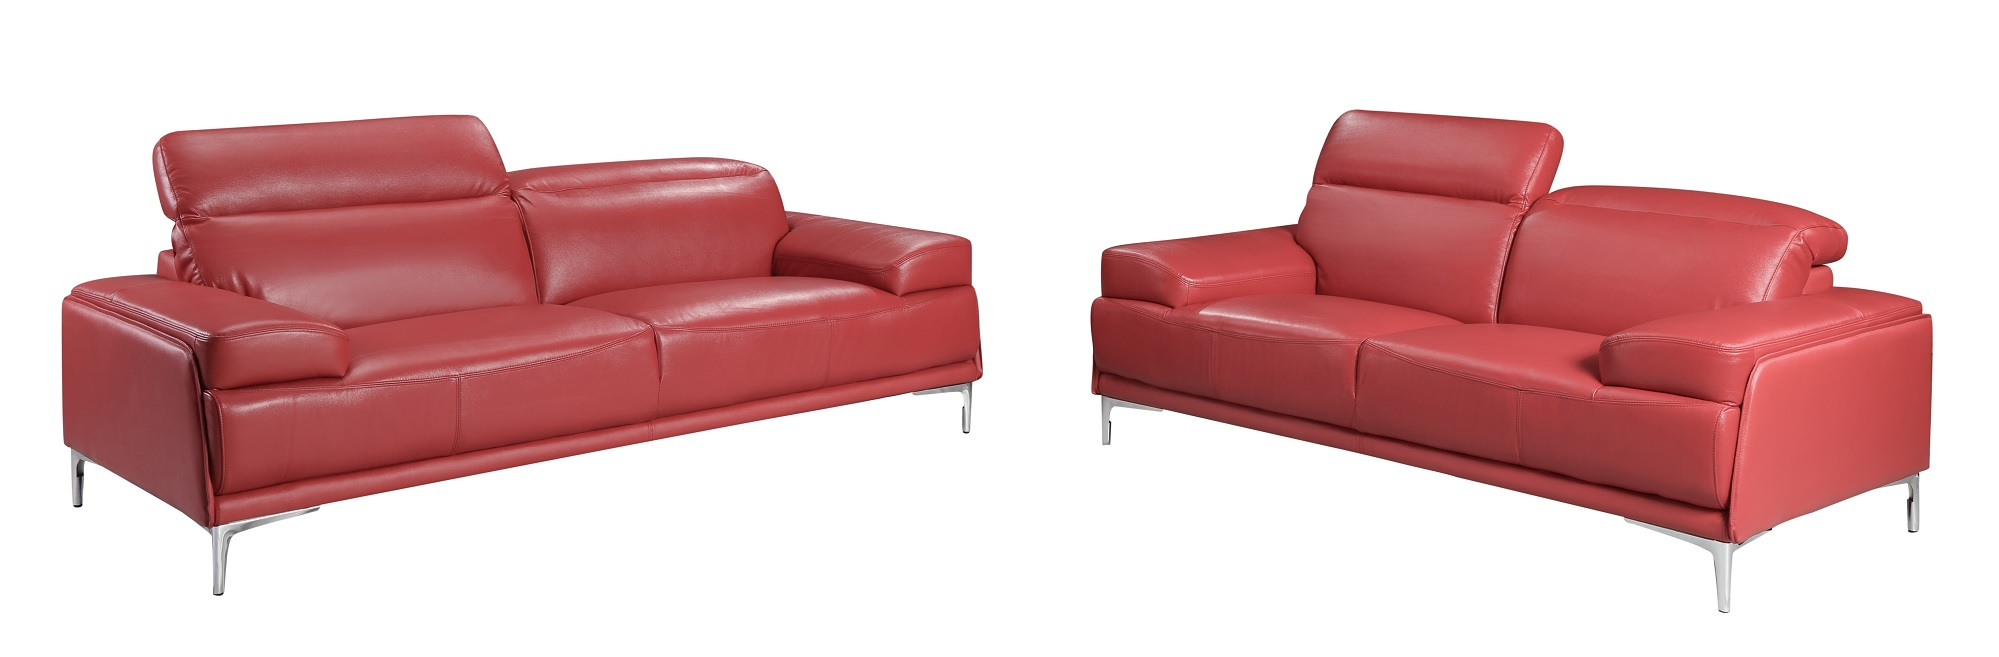 Nicolo Red Sofa Set